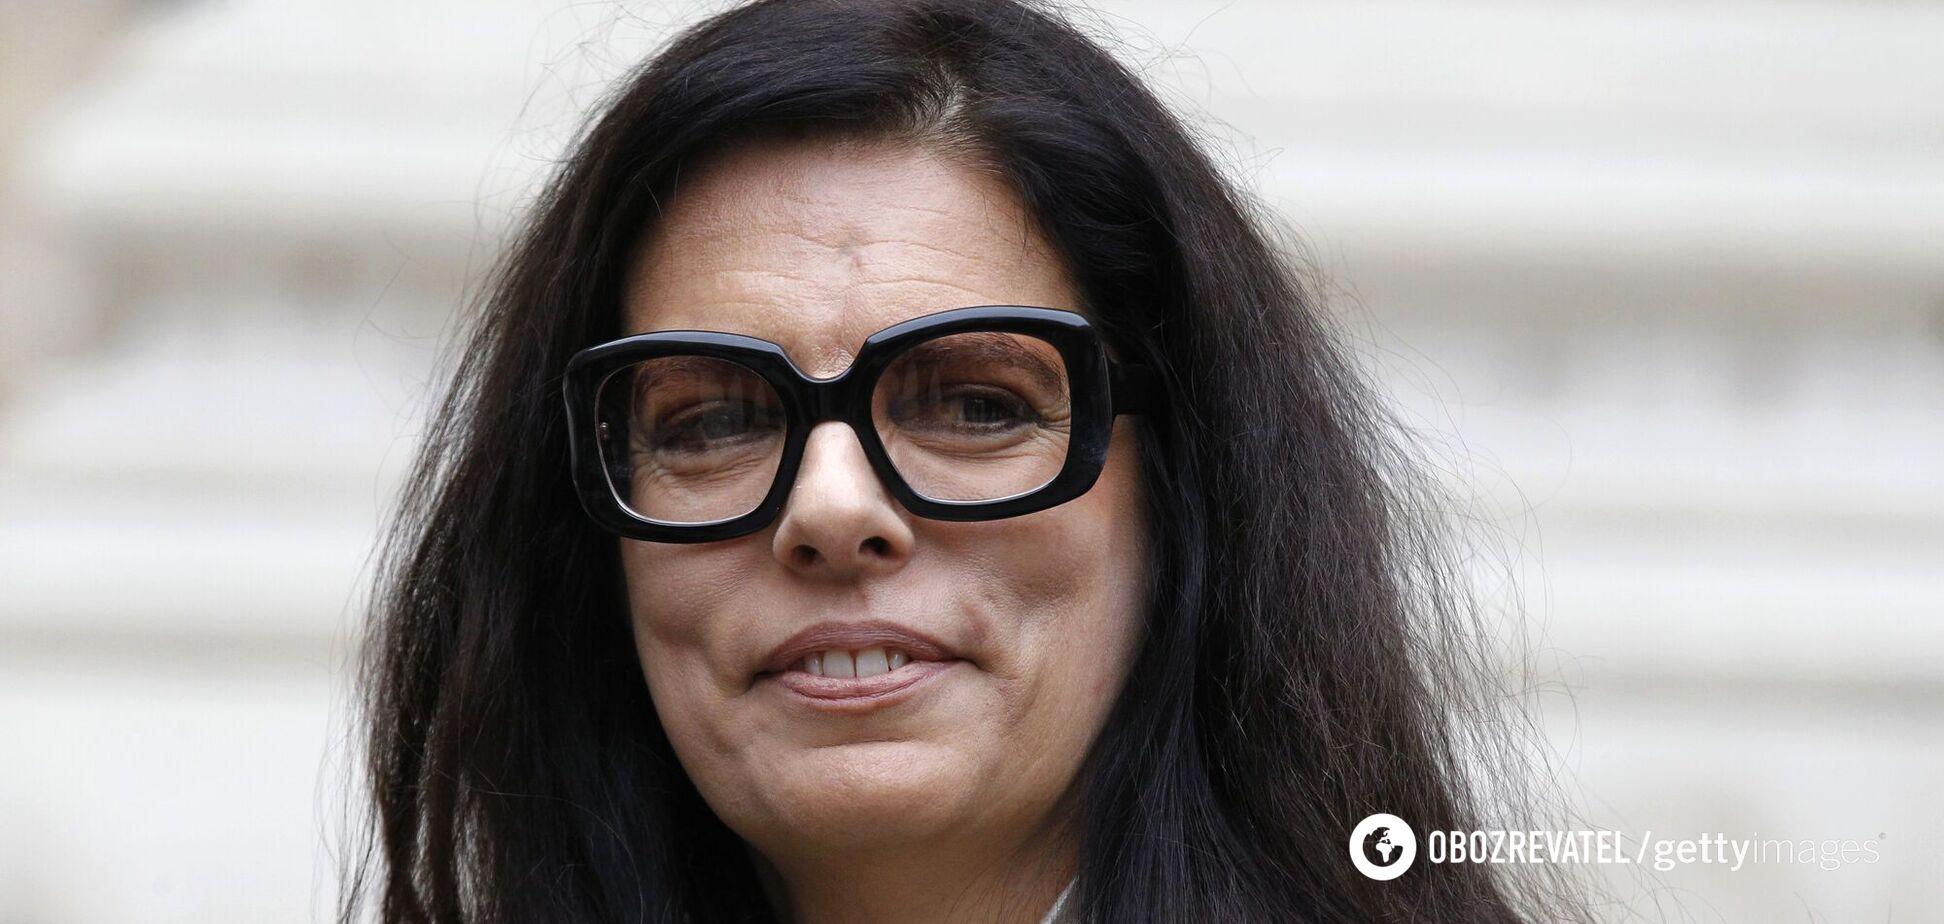 Франсуаза Бетанкур-Майєрс очолила рейтинг